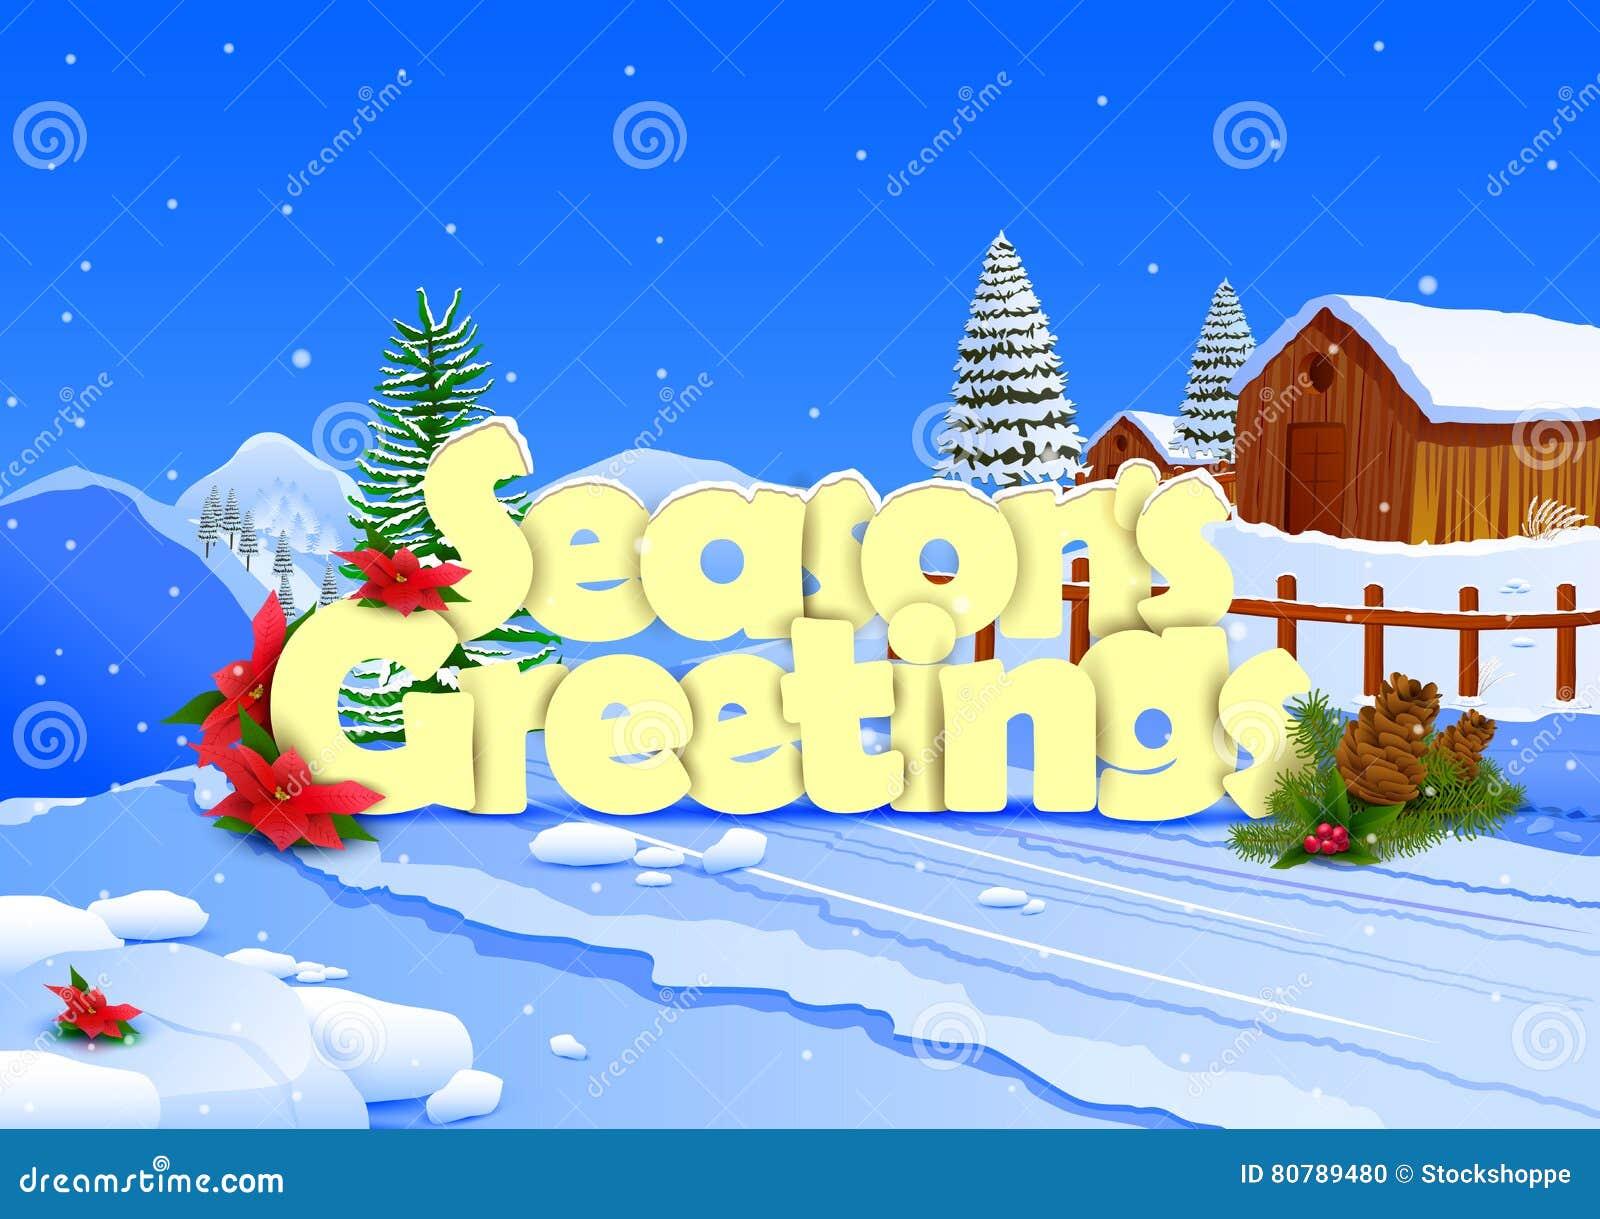 Seasons Greetings Wallpaper Background Stock Vector Illustration